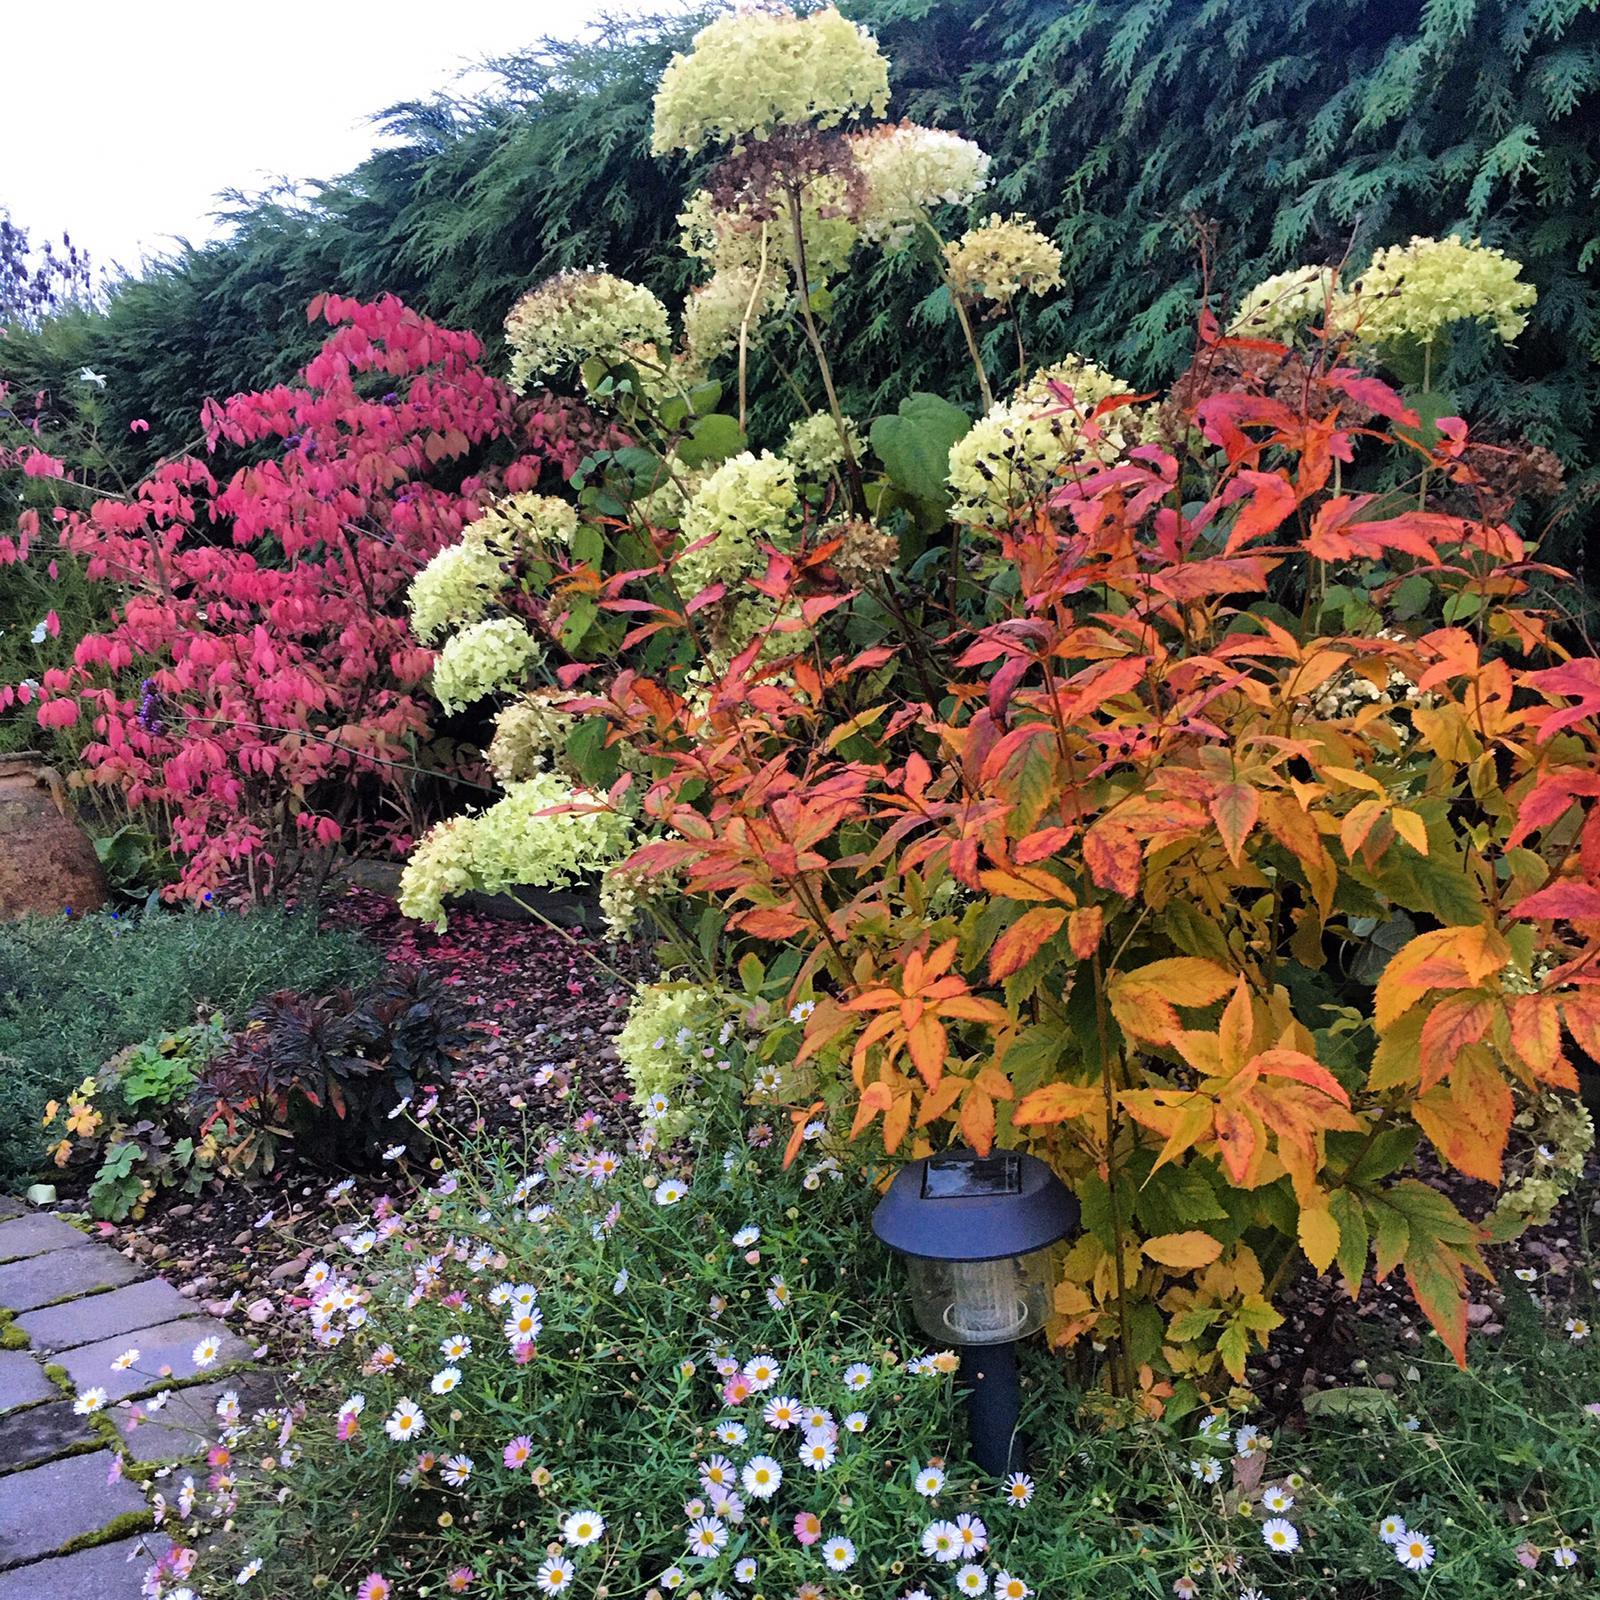 Gardens-Amy-autumn-1